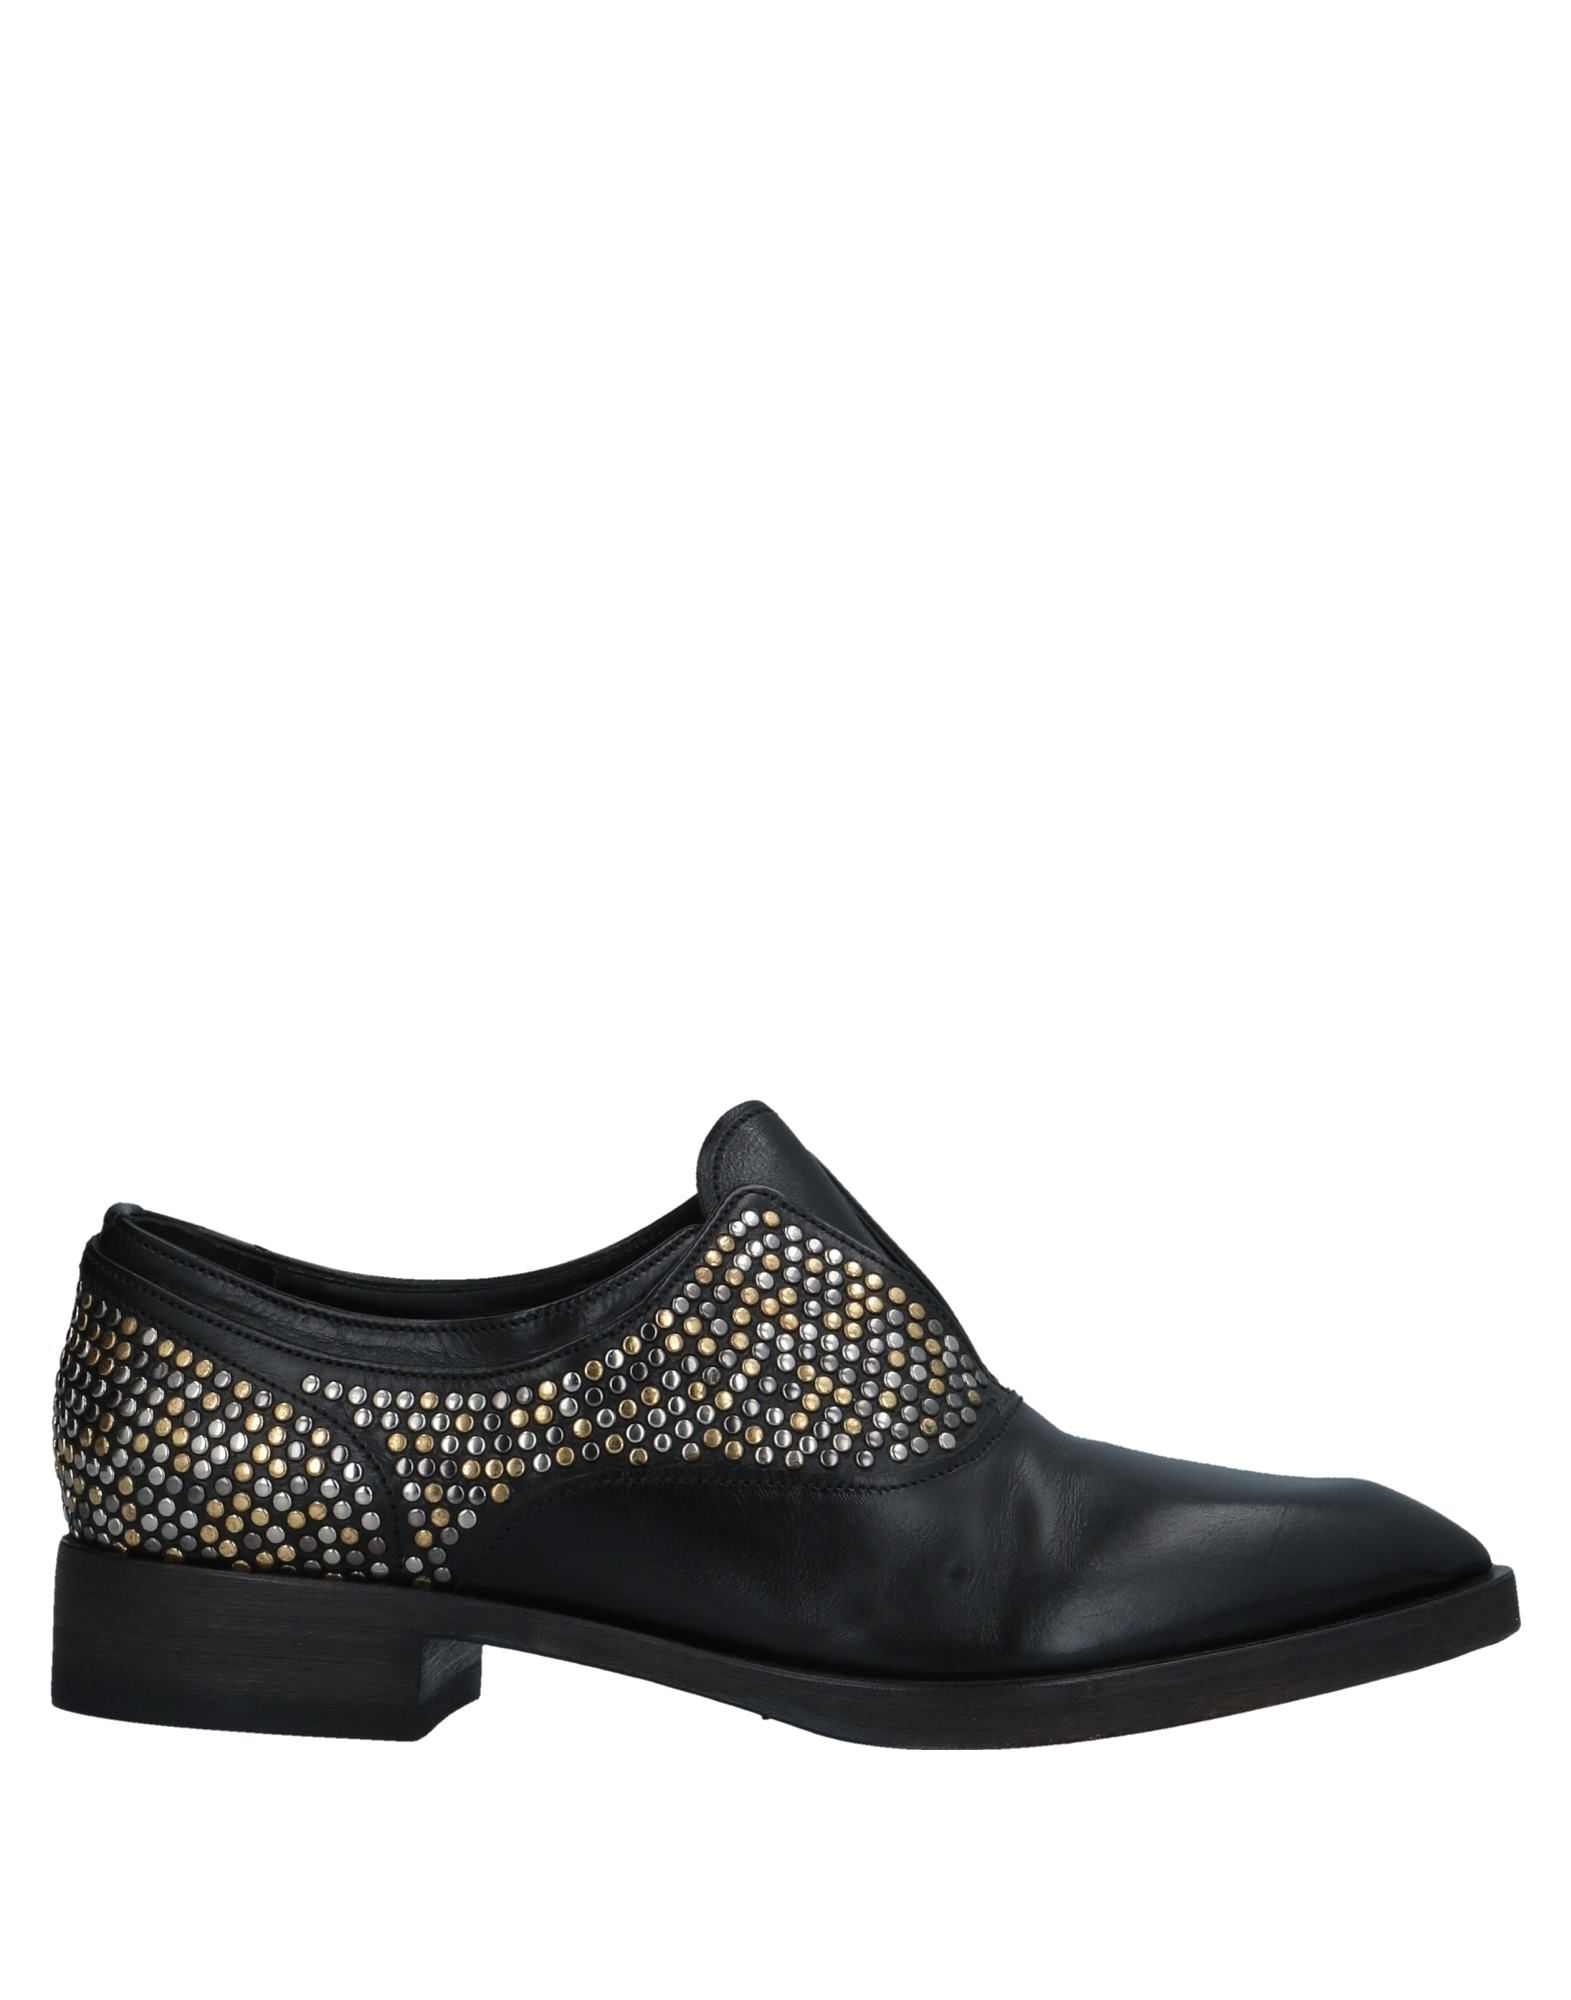 Premiata gut Mokassins Damen  11529303SBGünstige gut Premiata aussehende Schuhe a21500